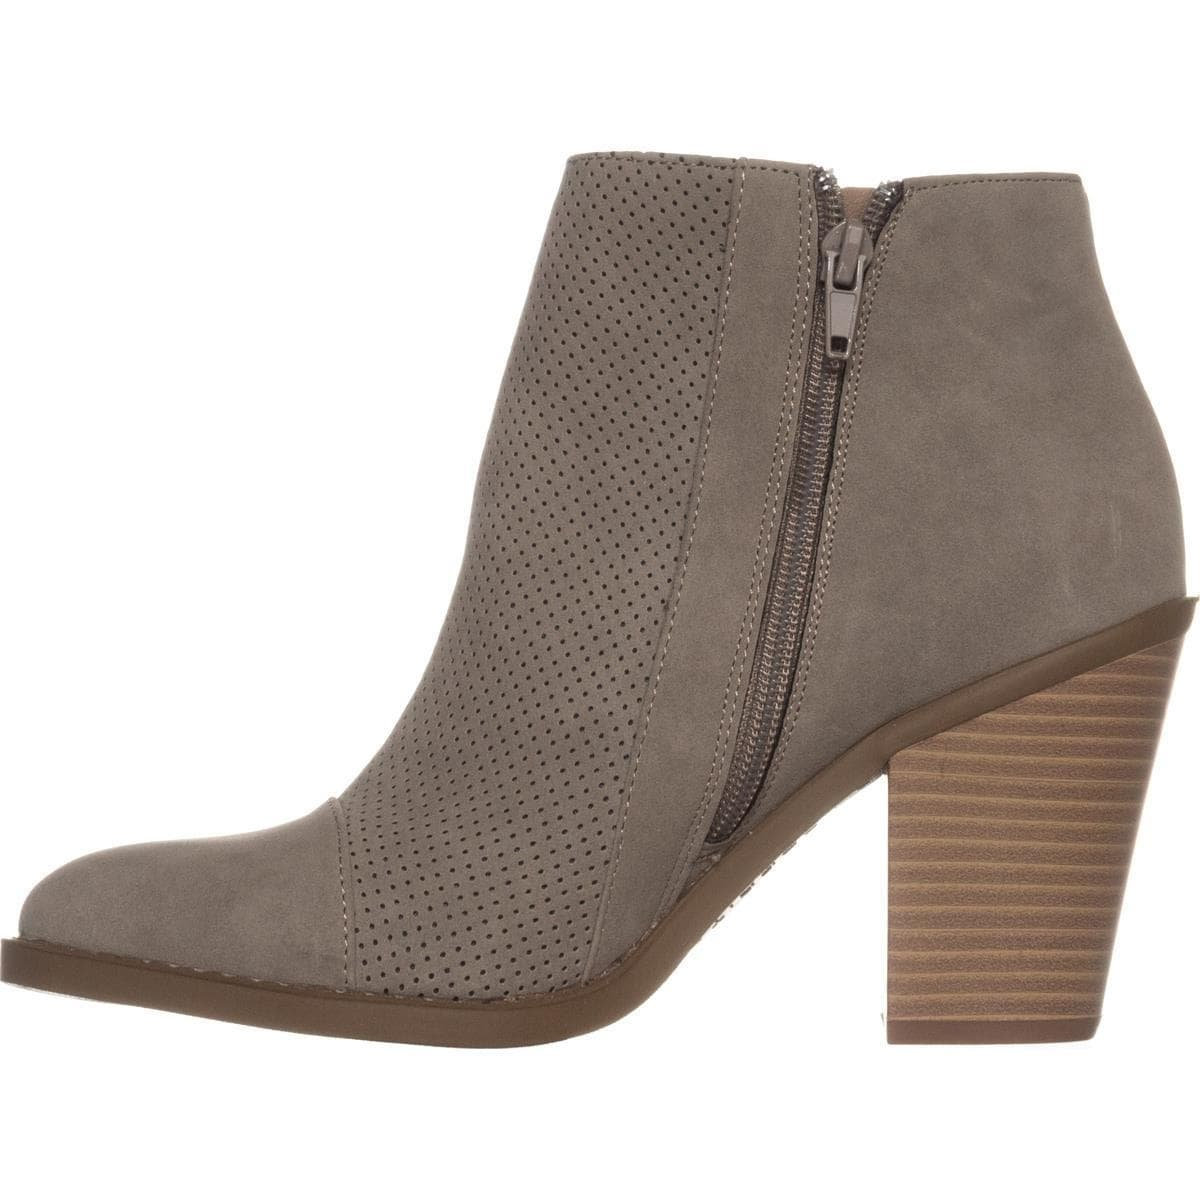 ESPRIT Damenschuhe Kali Cap Toe Toe Toe Ankle Fashion Stiefel a09624